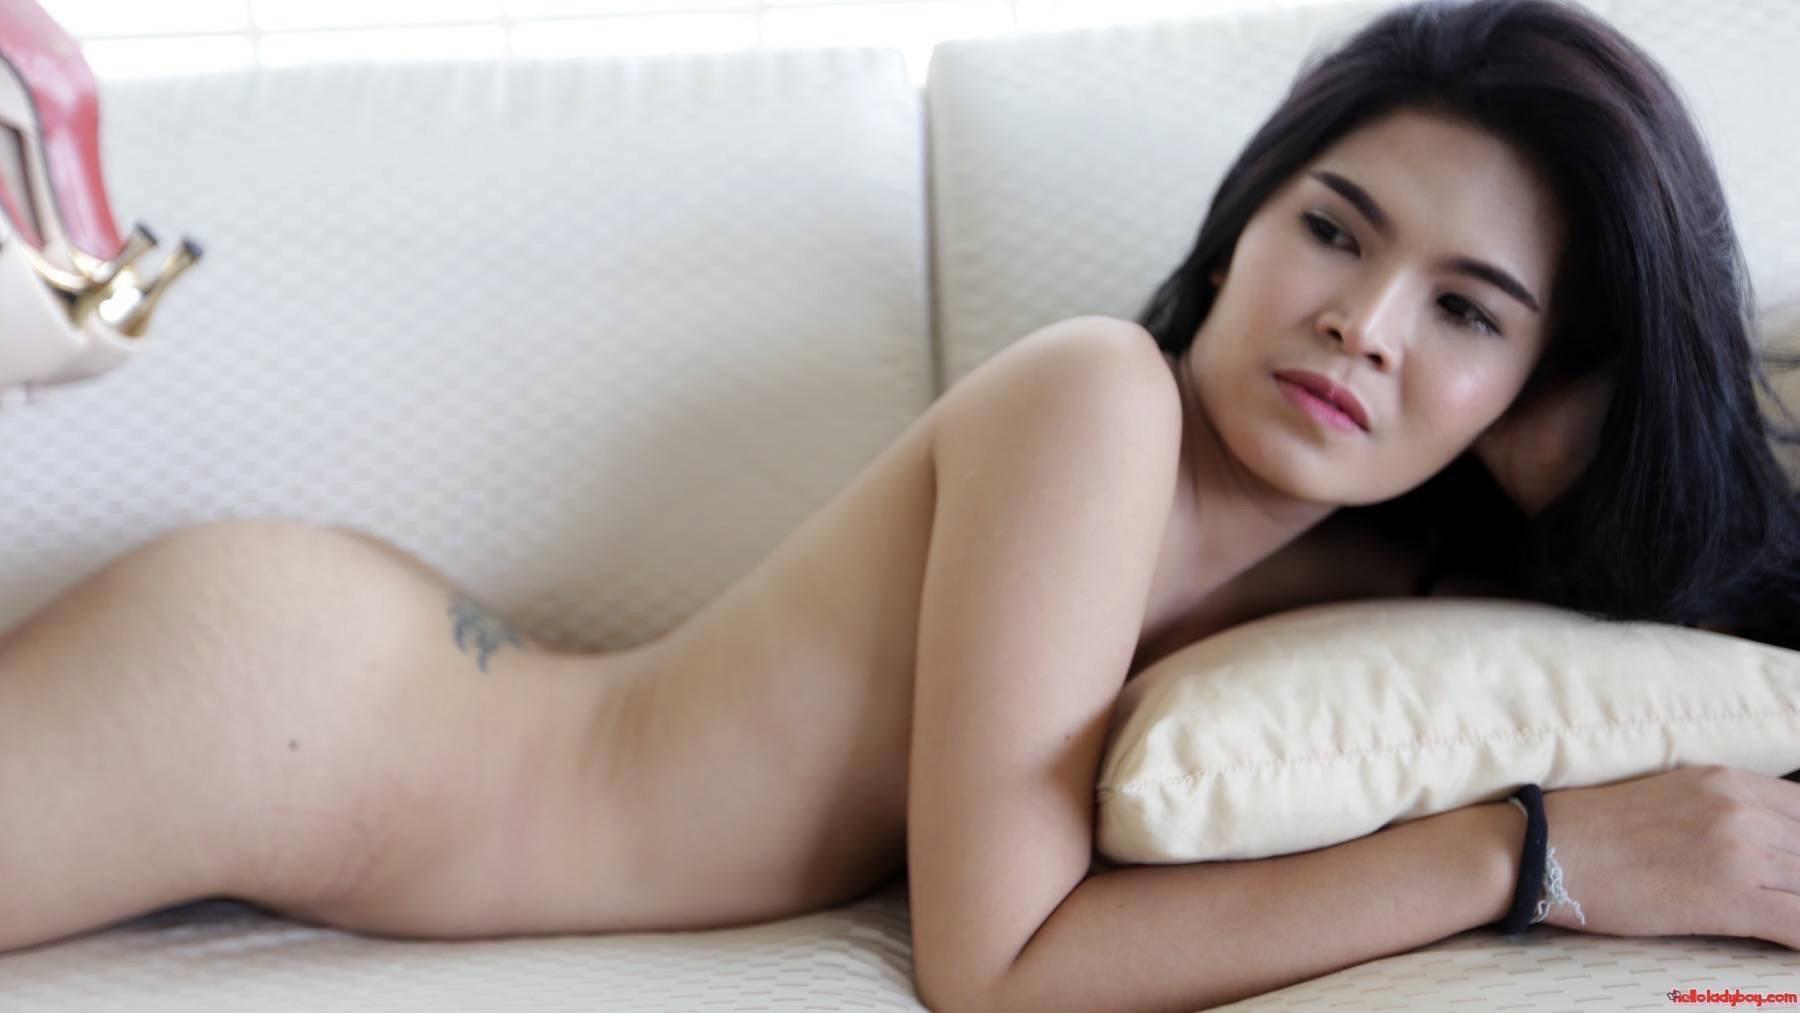 from Zavier asian shemales hardcore sex